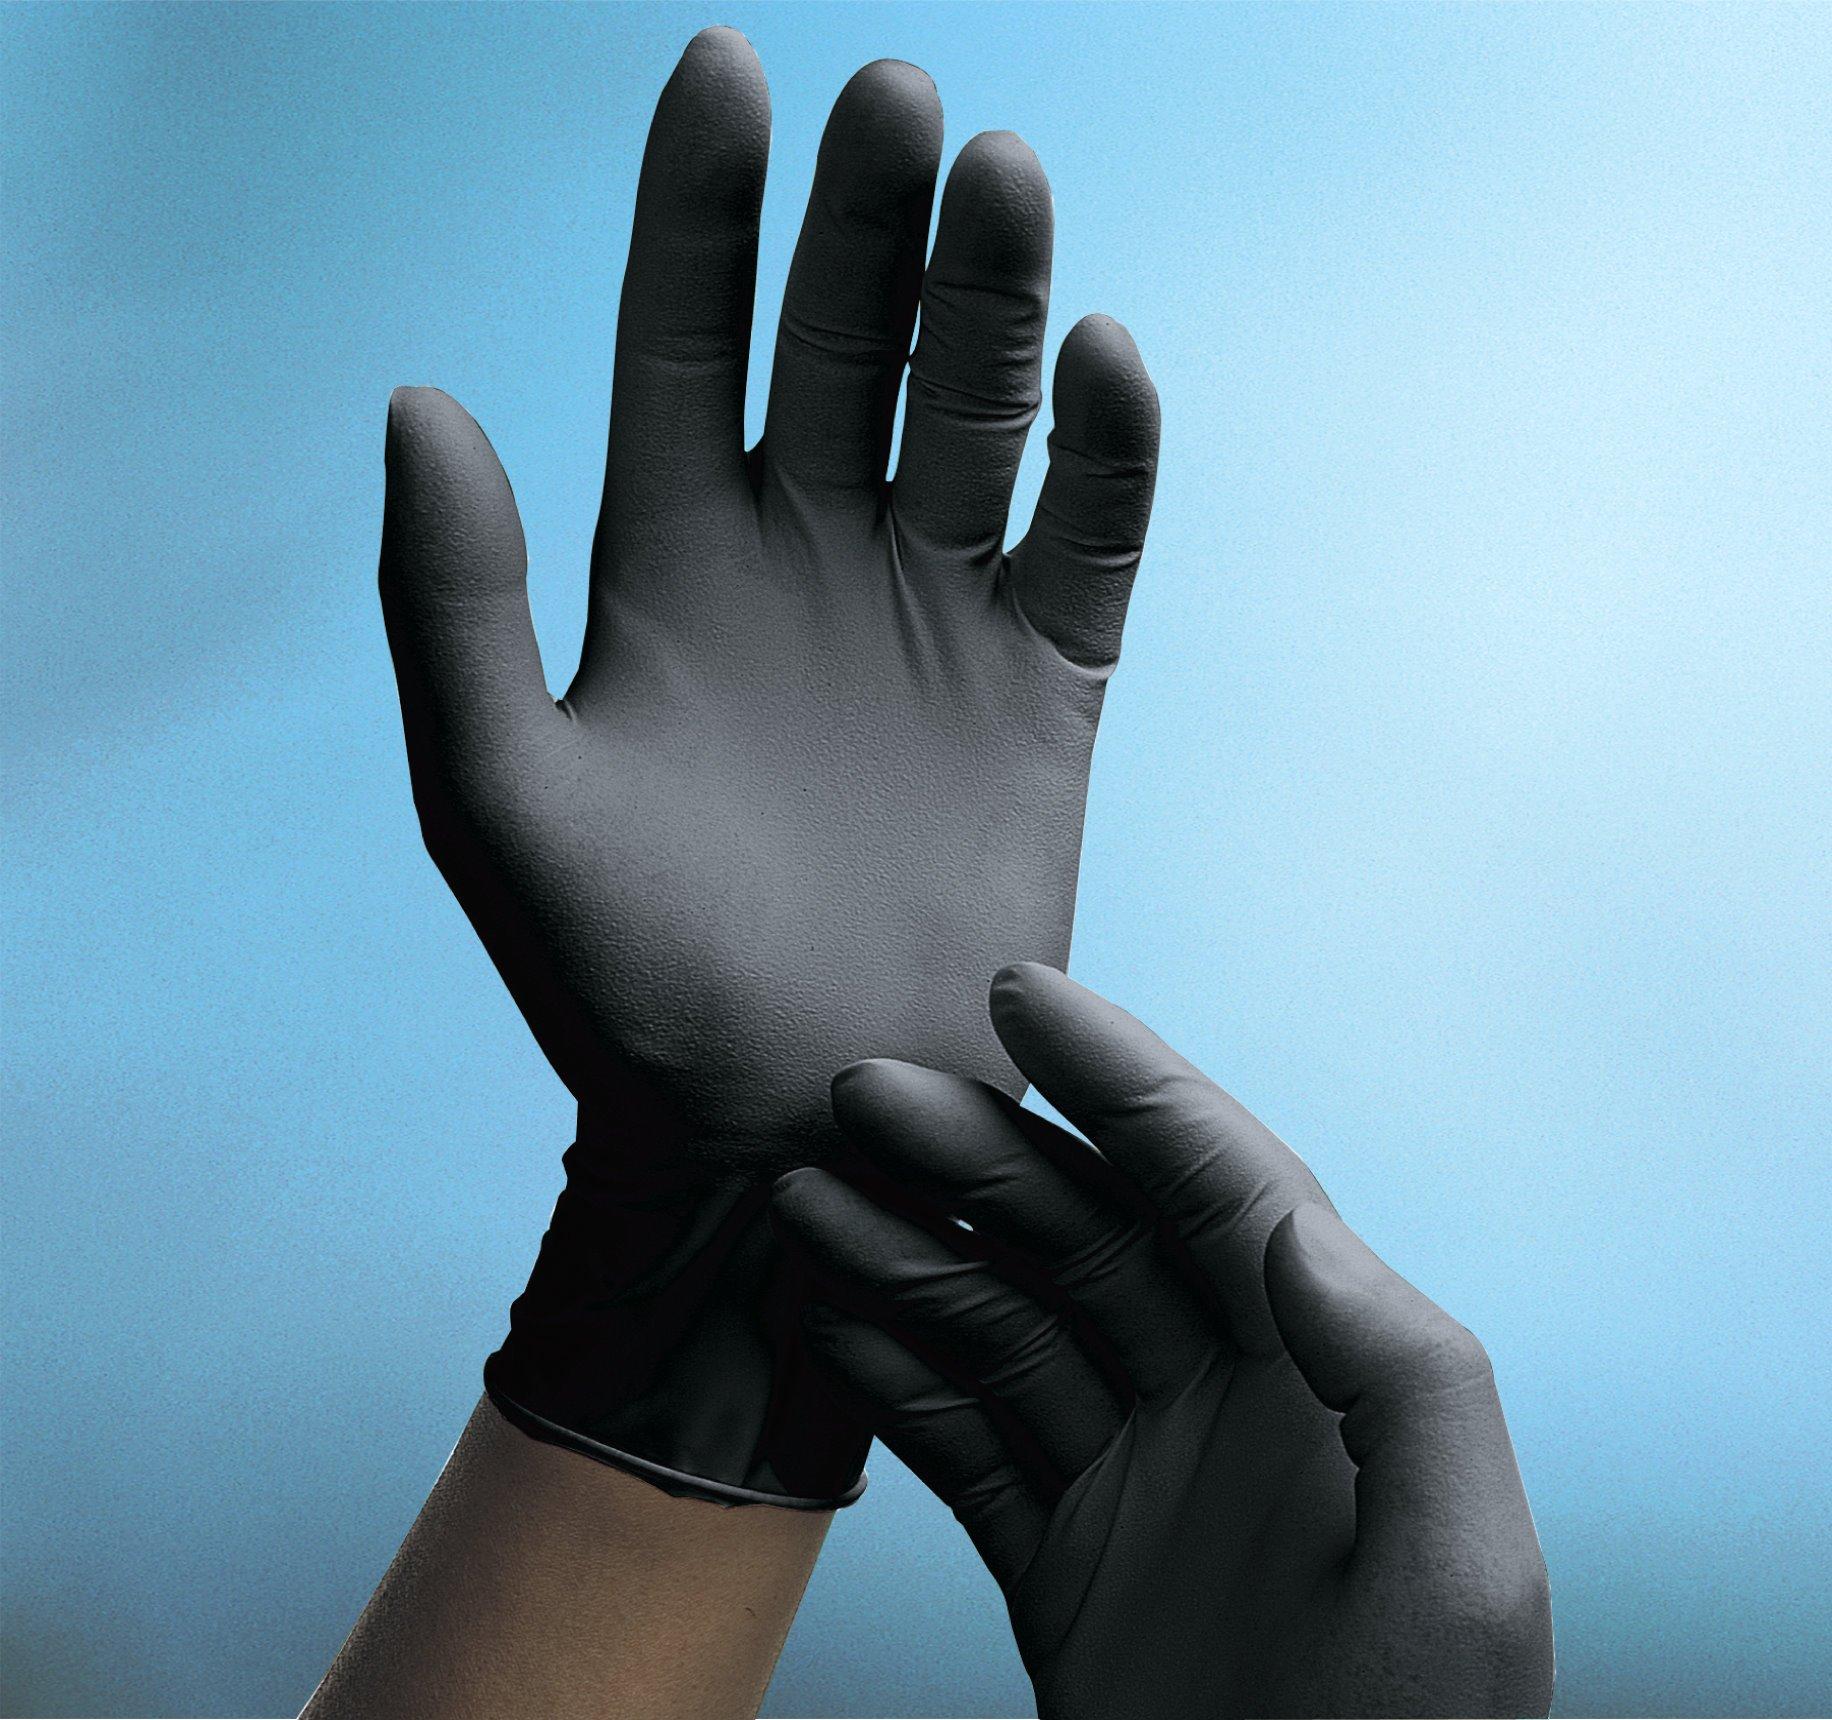 Phantom Black Latex Gloves- Examination Grade (Case of 10 boxes- Medium) by TrippleCream (Image #2)